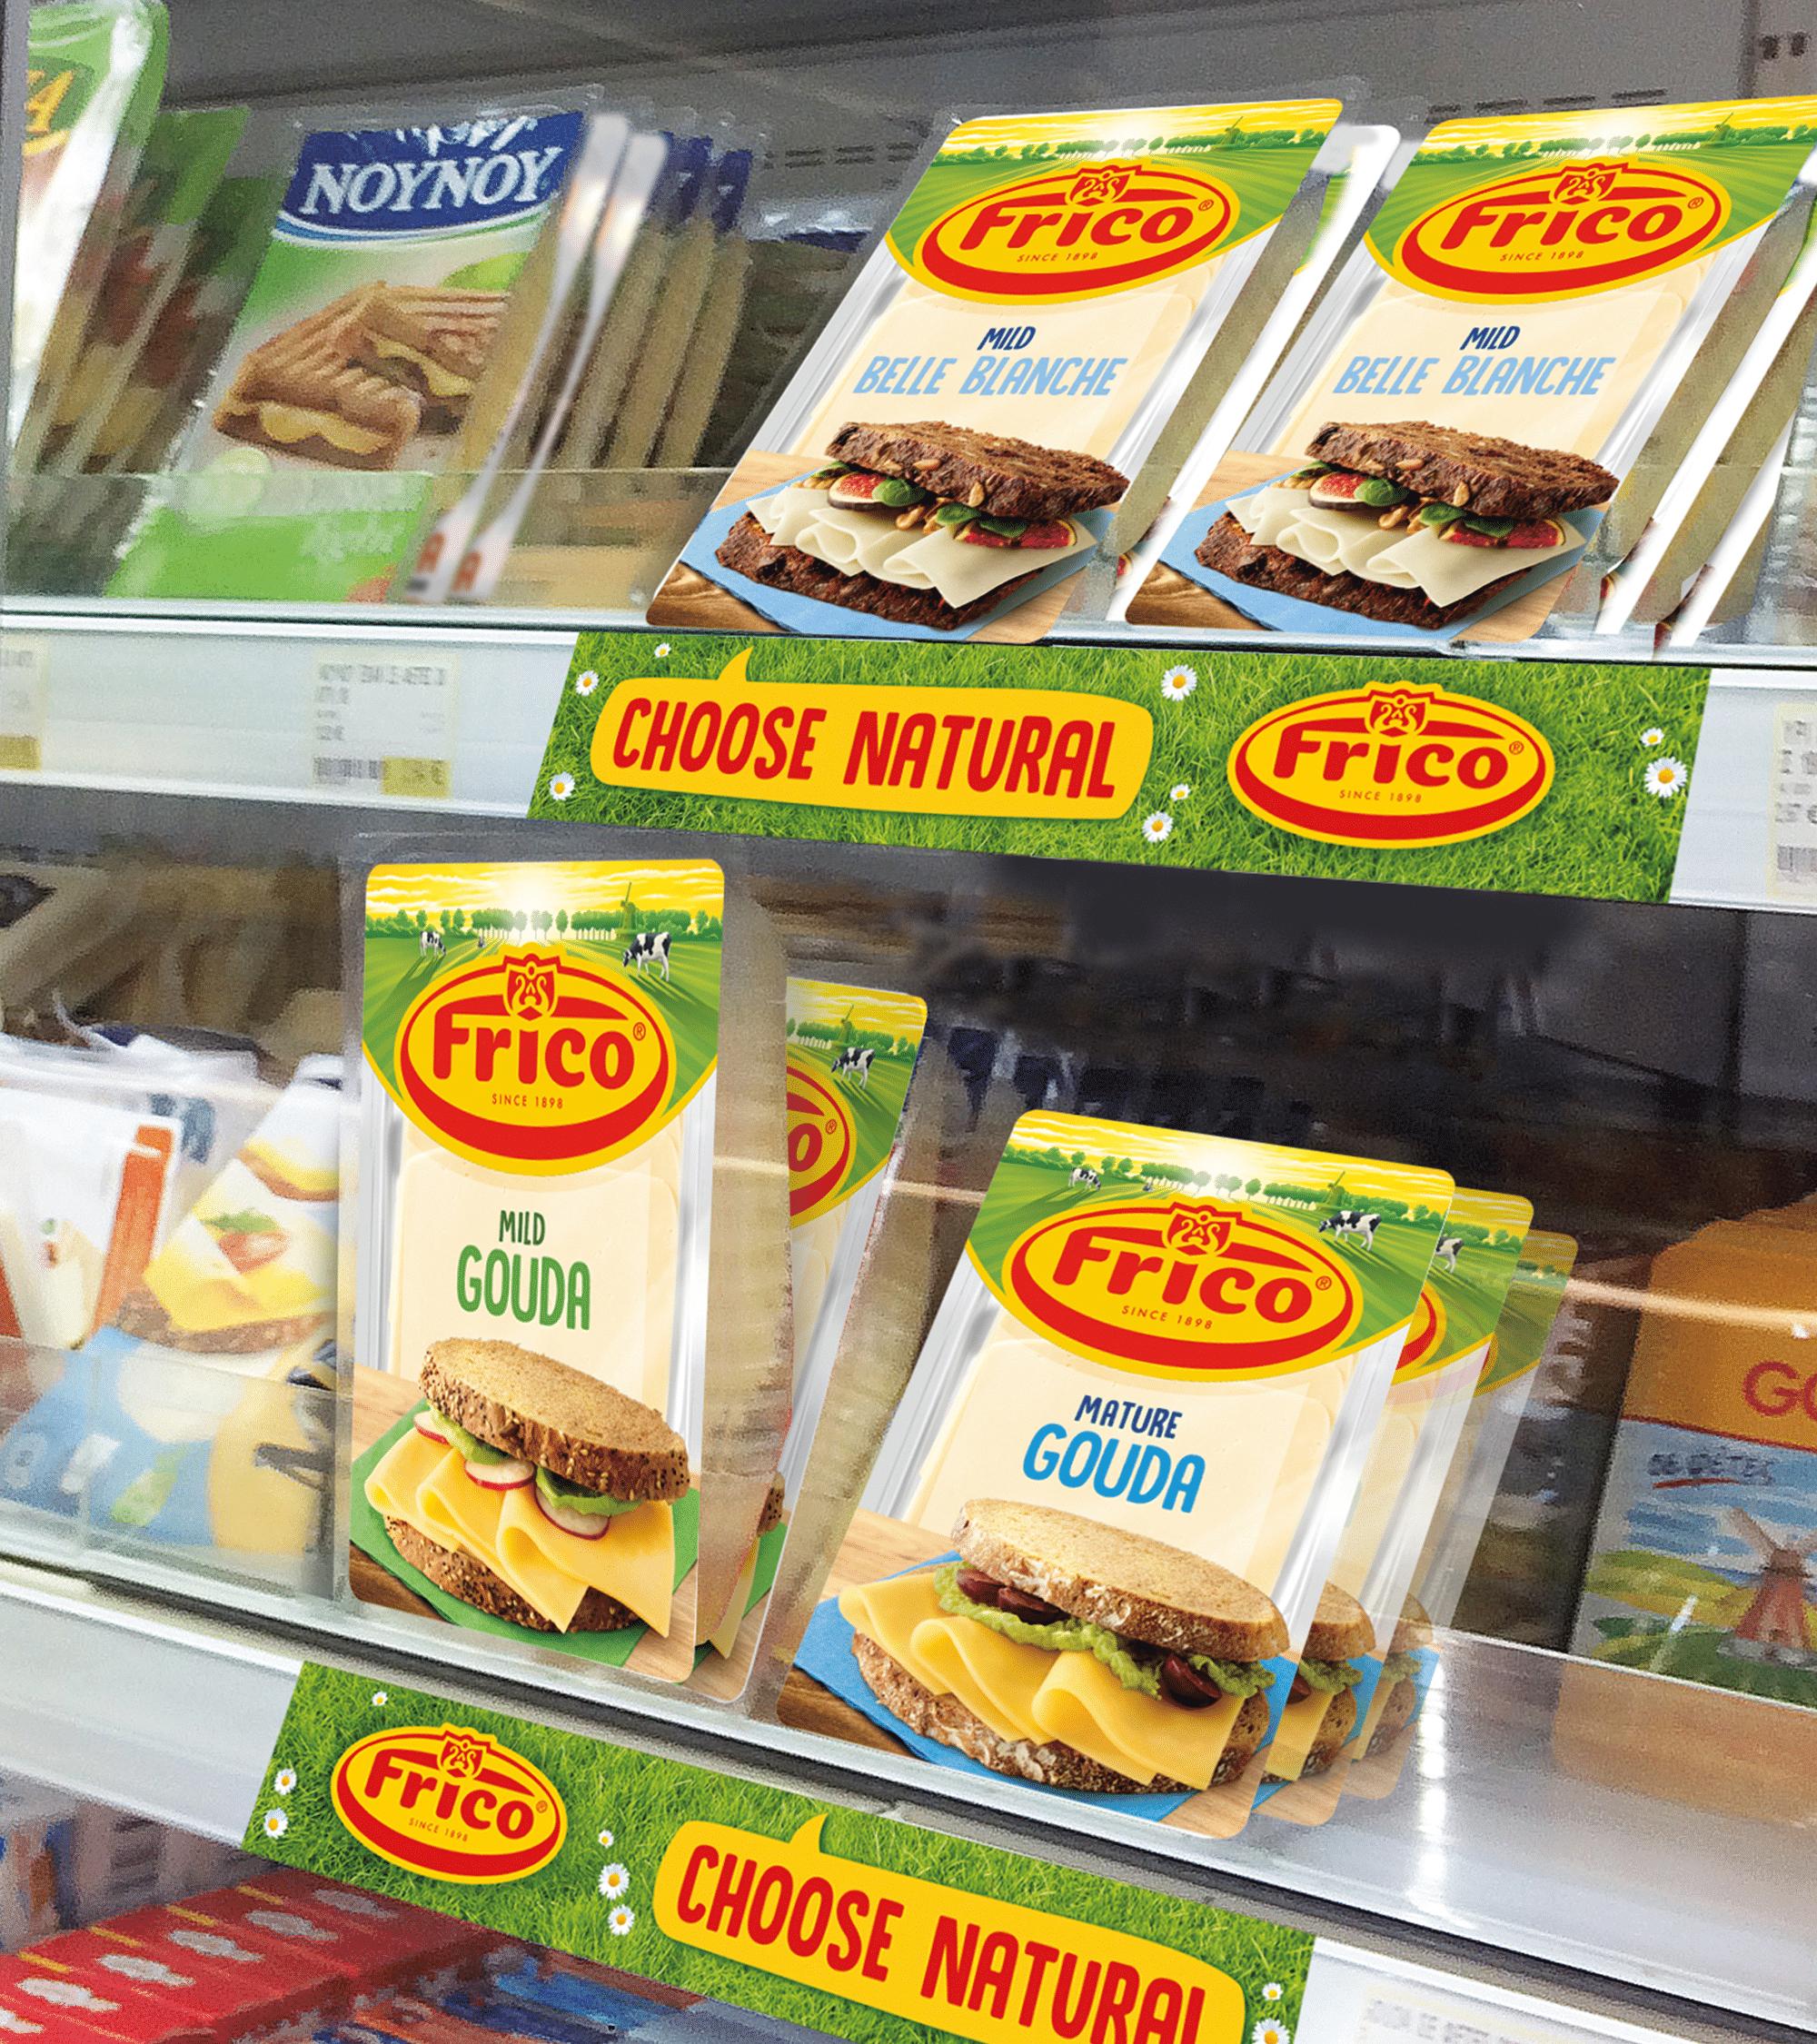 Frico in Supermarket